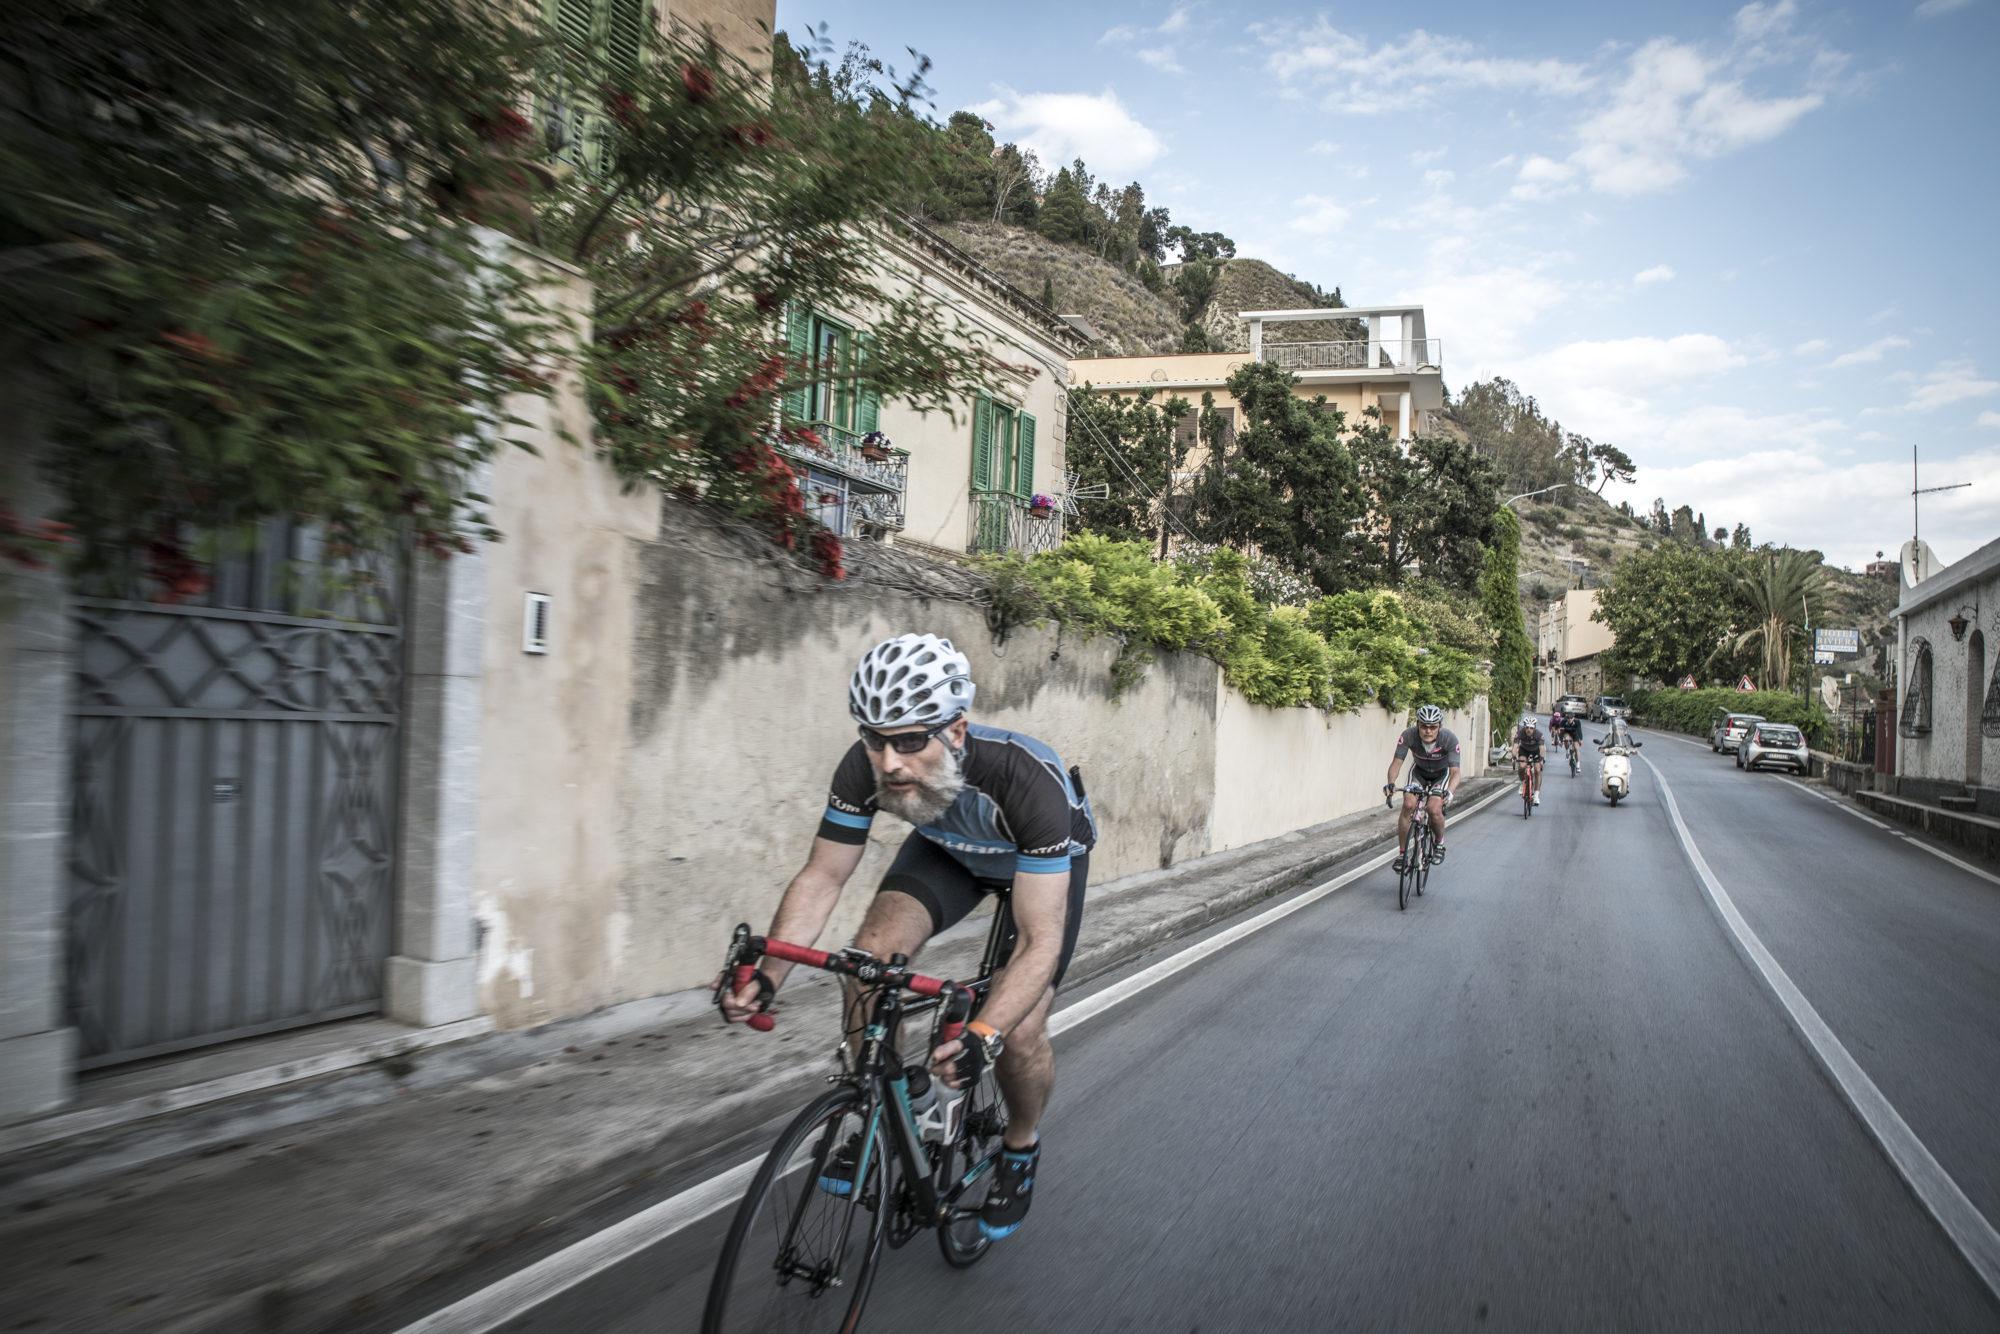 Full speed ahead in Sicily.